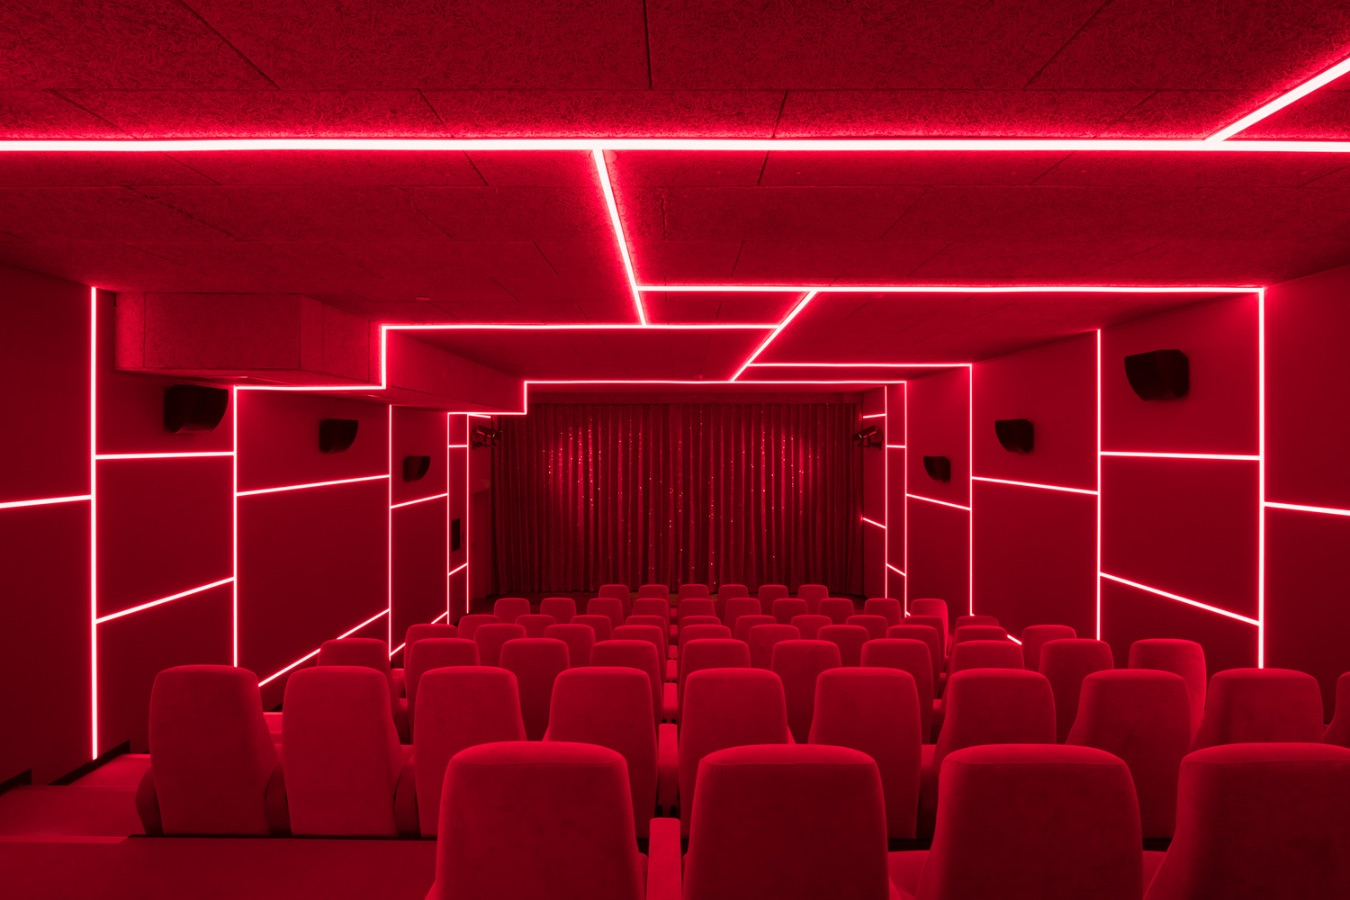 1_Delphi LUX Cinema_Batek Architekten+Ester Bruzkus Architekten_Inspirationist